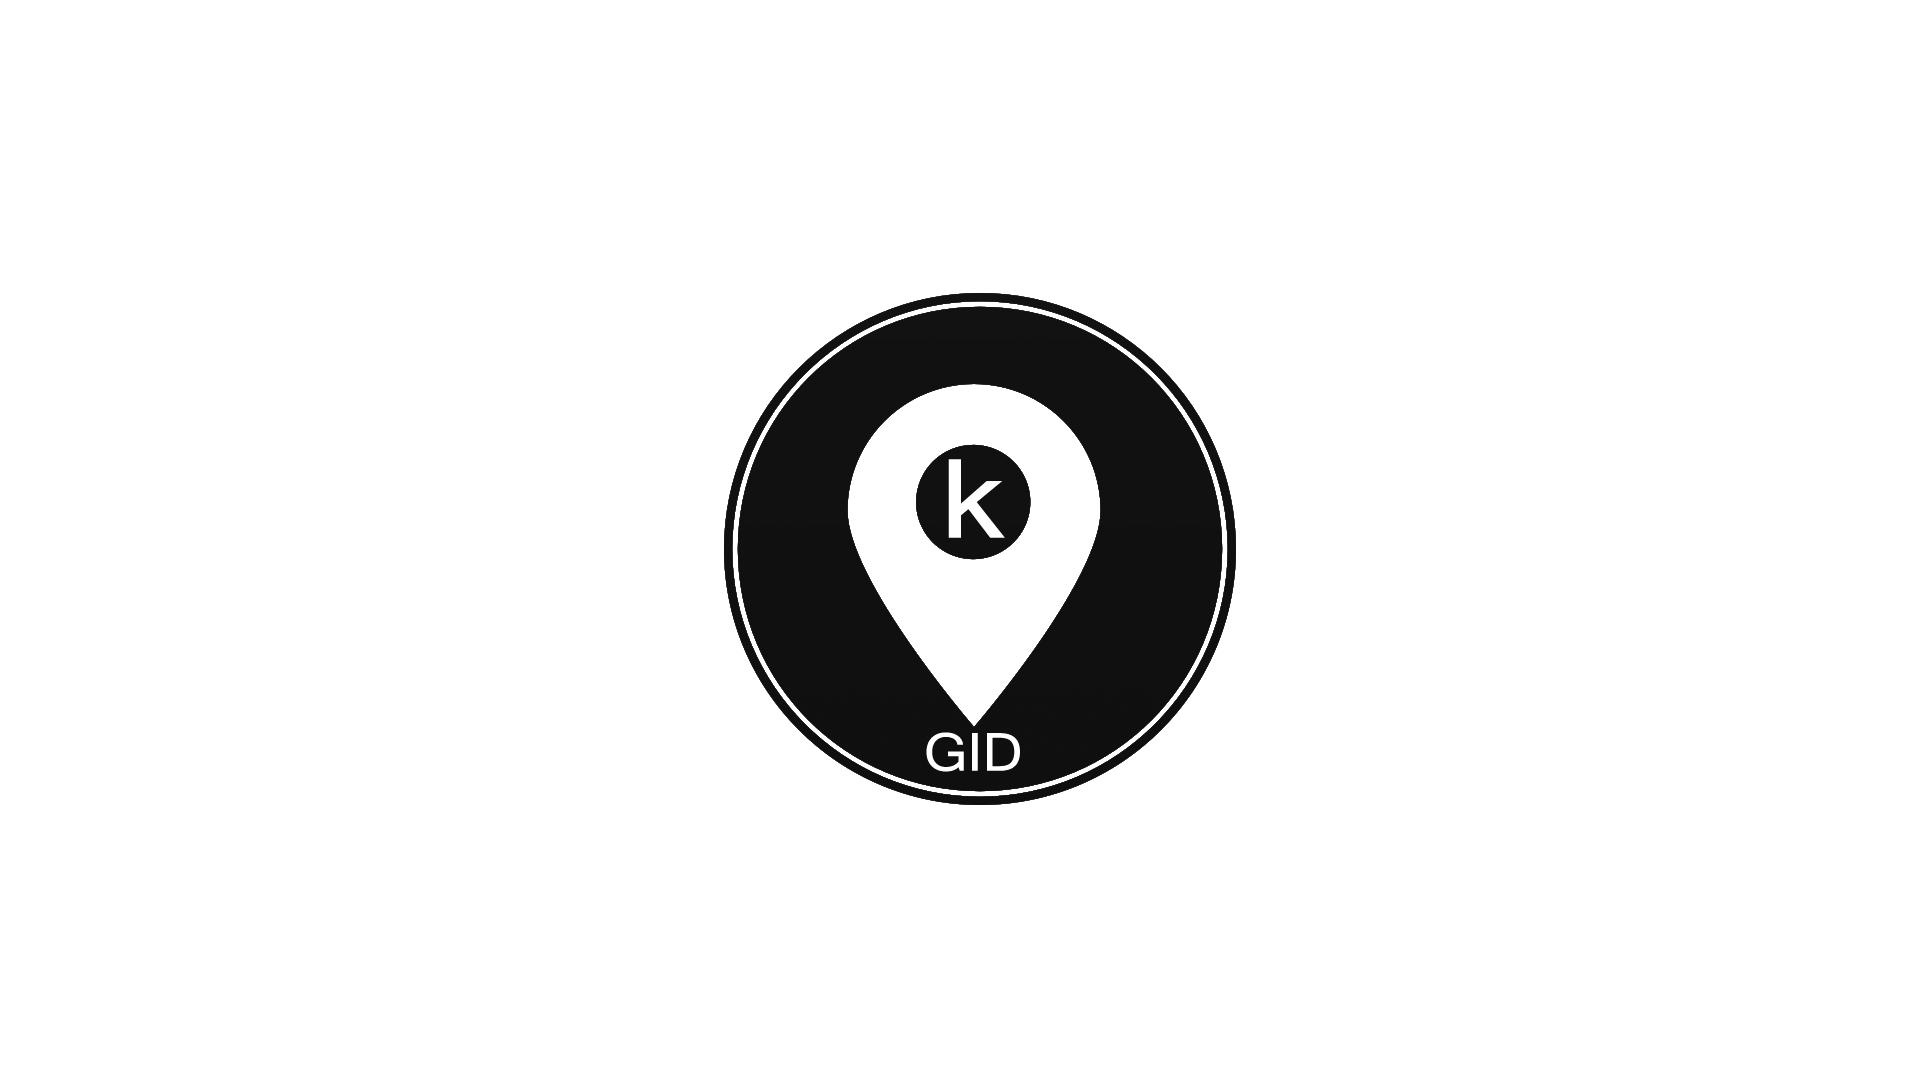 Логотип для сайта OKgid.ru фото f_94357c6d9db95157.png